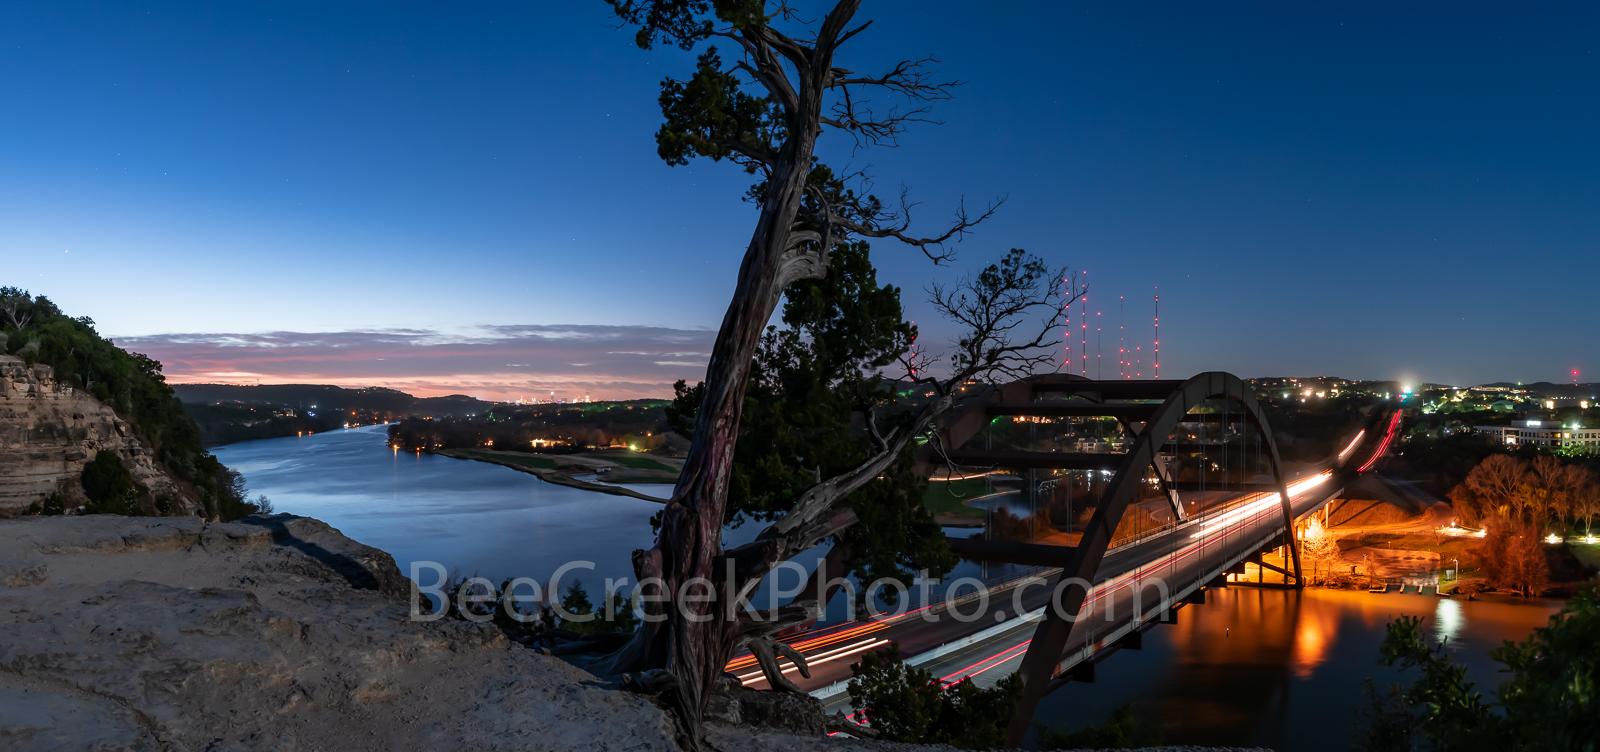 Austin, Pennybacker Bridge, sunrise, austin 360 bridge, lake austin, night, dark, cliffs, austin skyline, boating, urban, pano, panorama, early morning, architecture,, photo